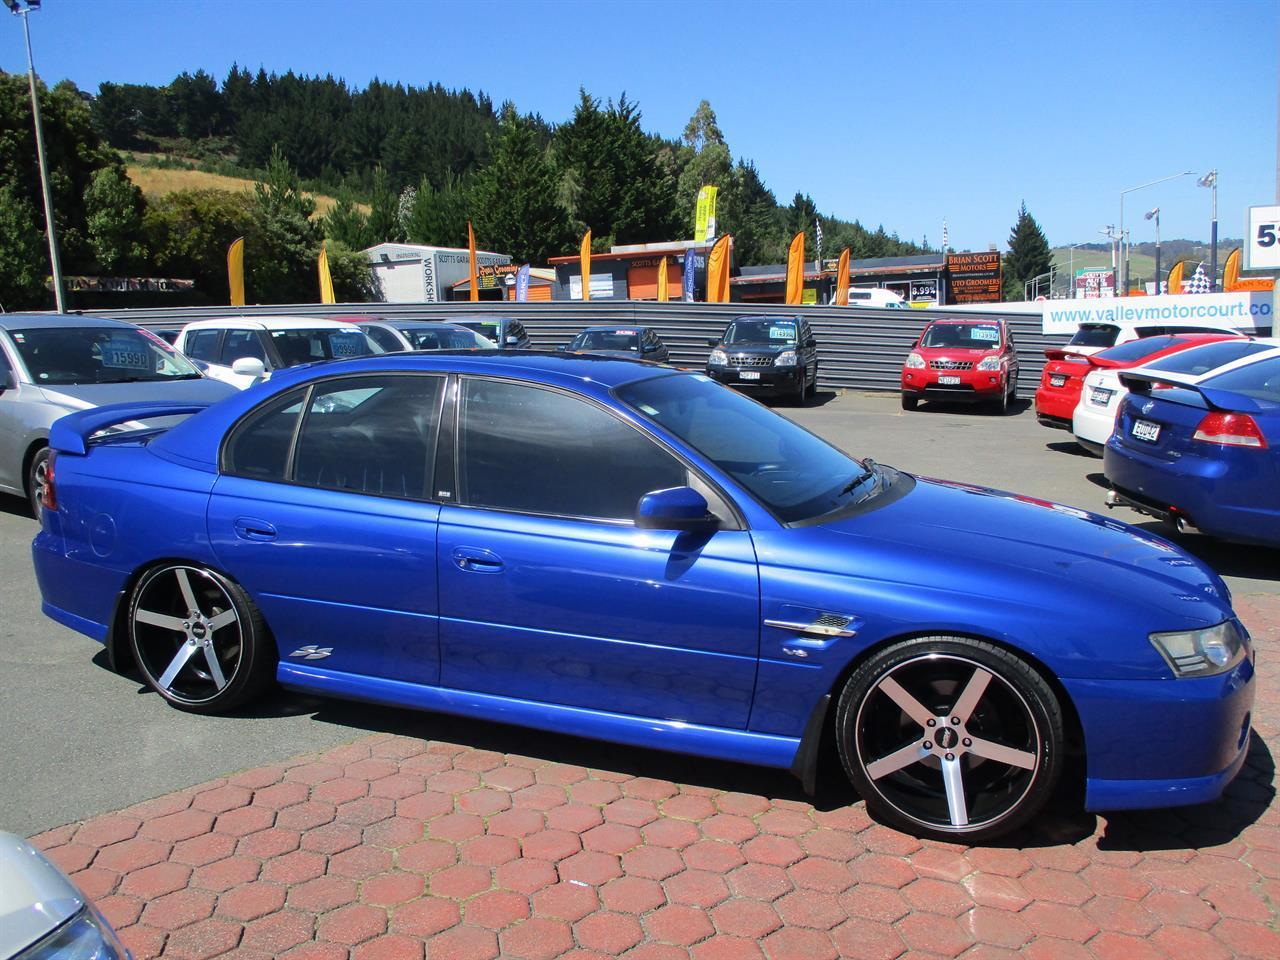 image-3, 2005 Holden Commodore VZ SS at Dunedin